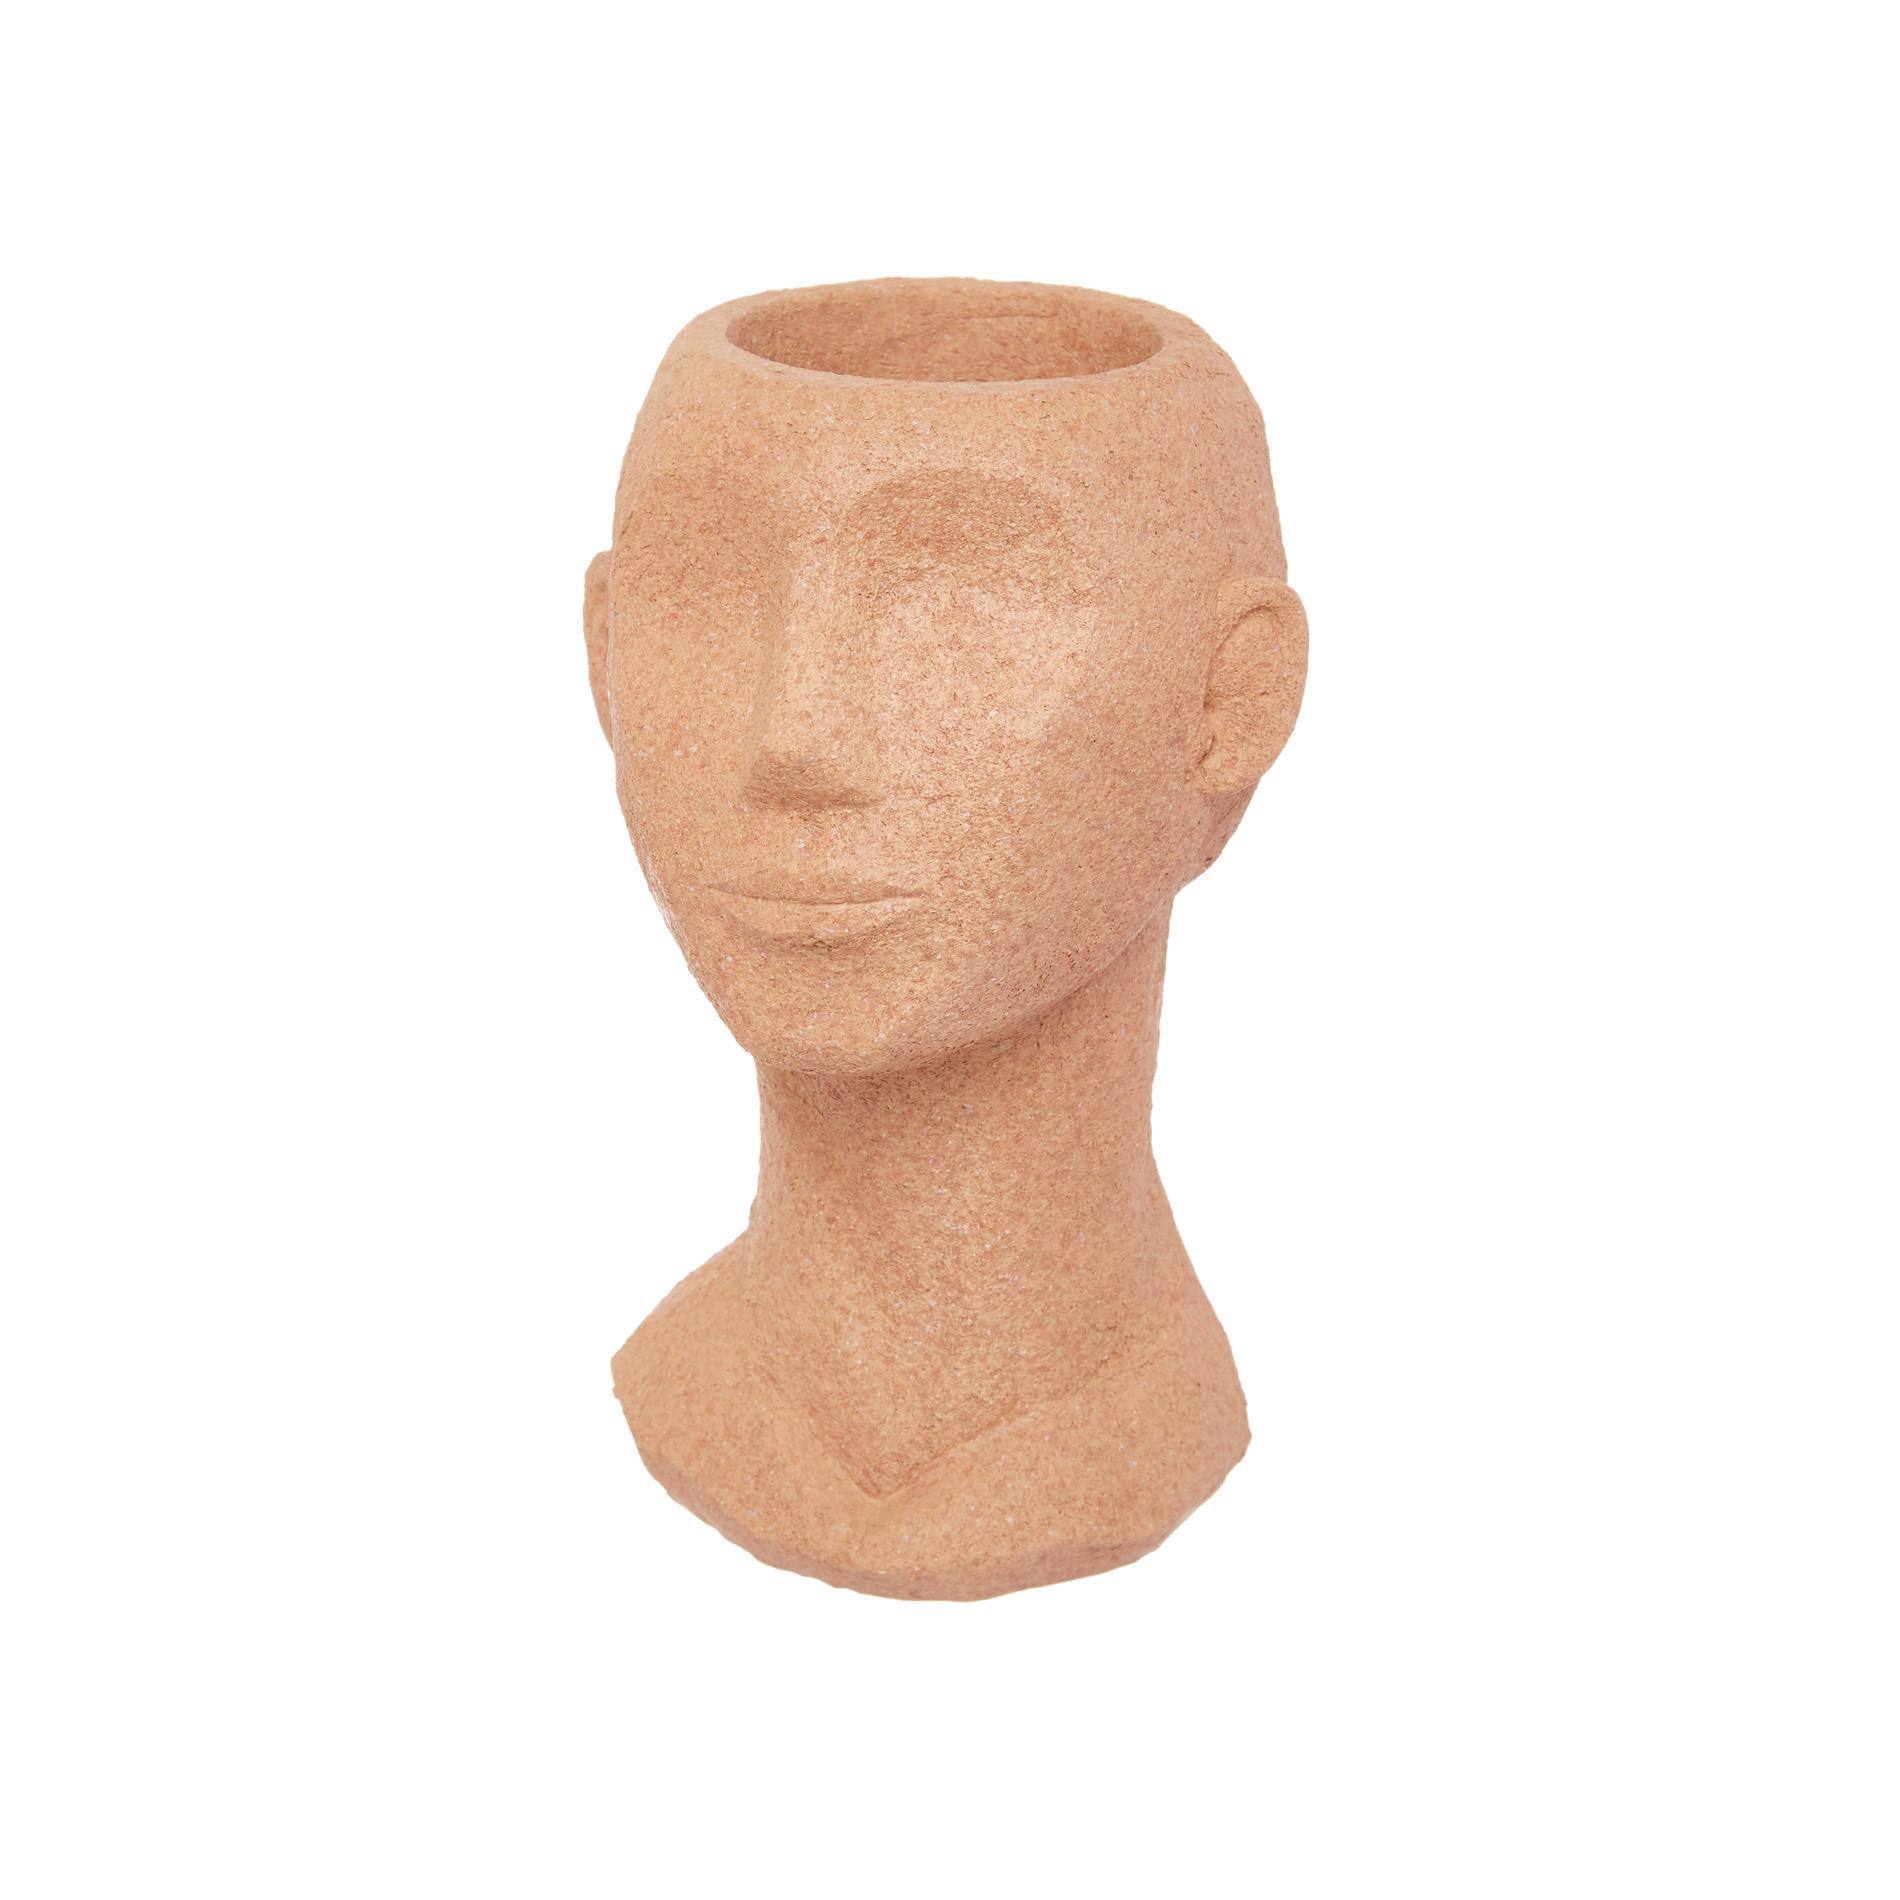 Vaso testa di donna rifinito a mano, Bianco, large image number 0